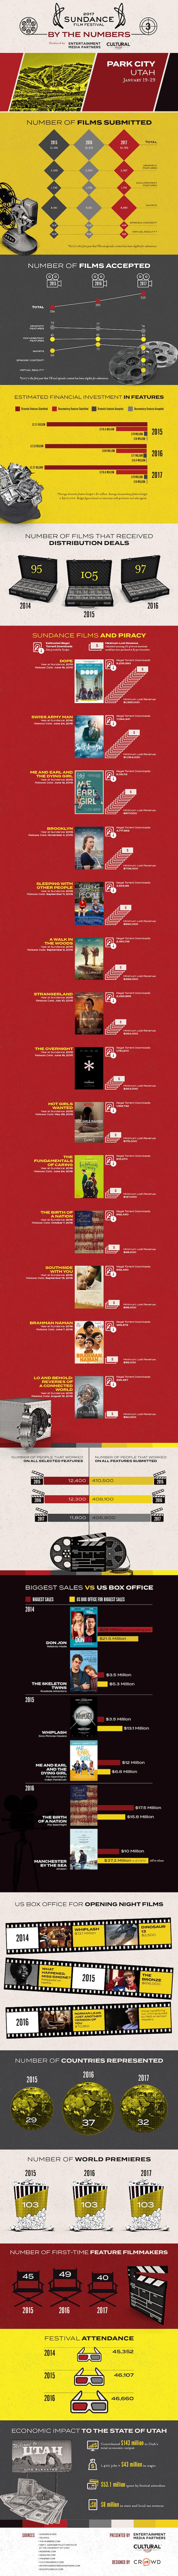 Sundance 2017 Infographic